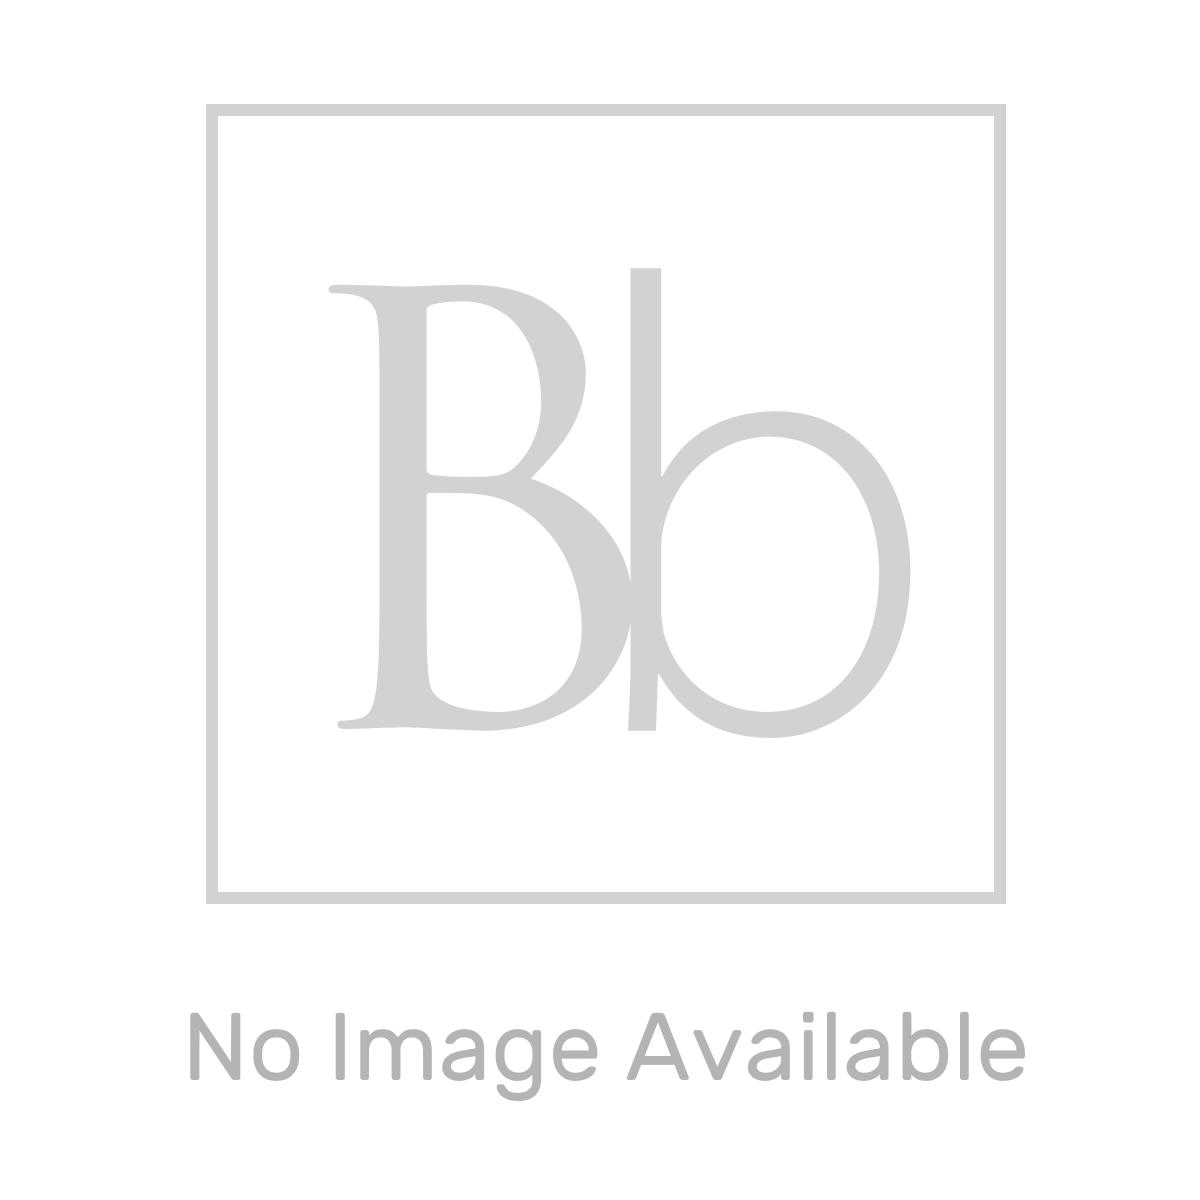 Salamander RP50PT 1.5 Bar Twin Positive Head Shower Pump Right Side